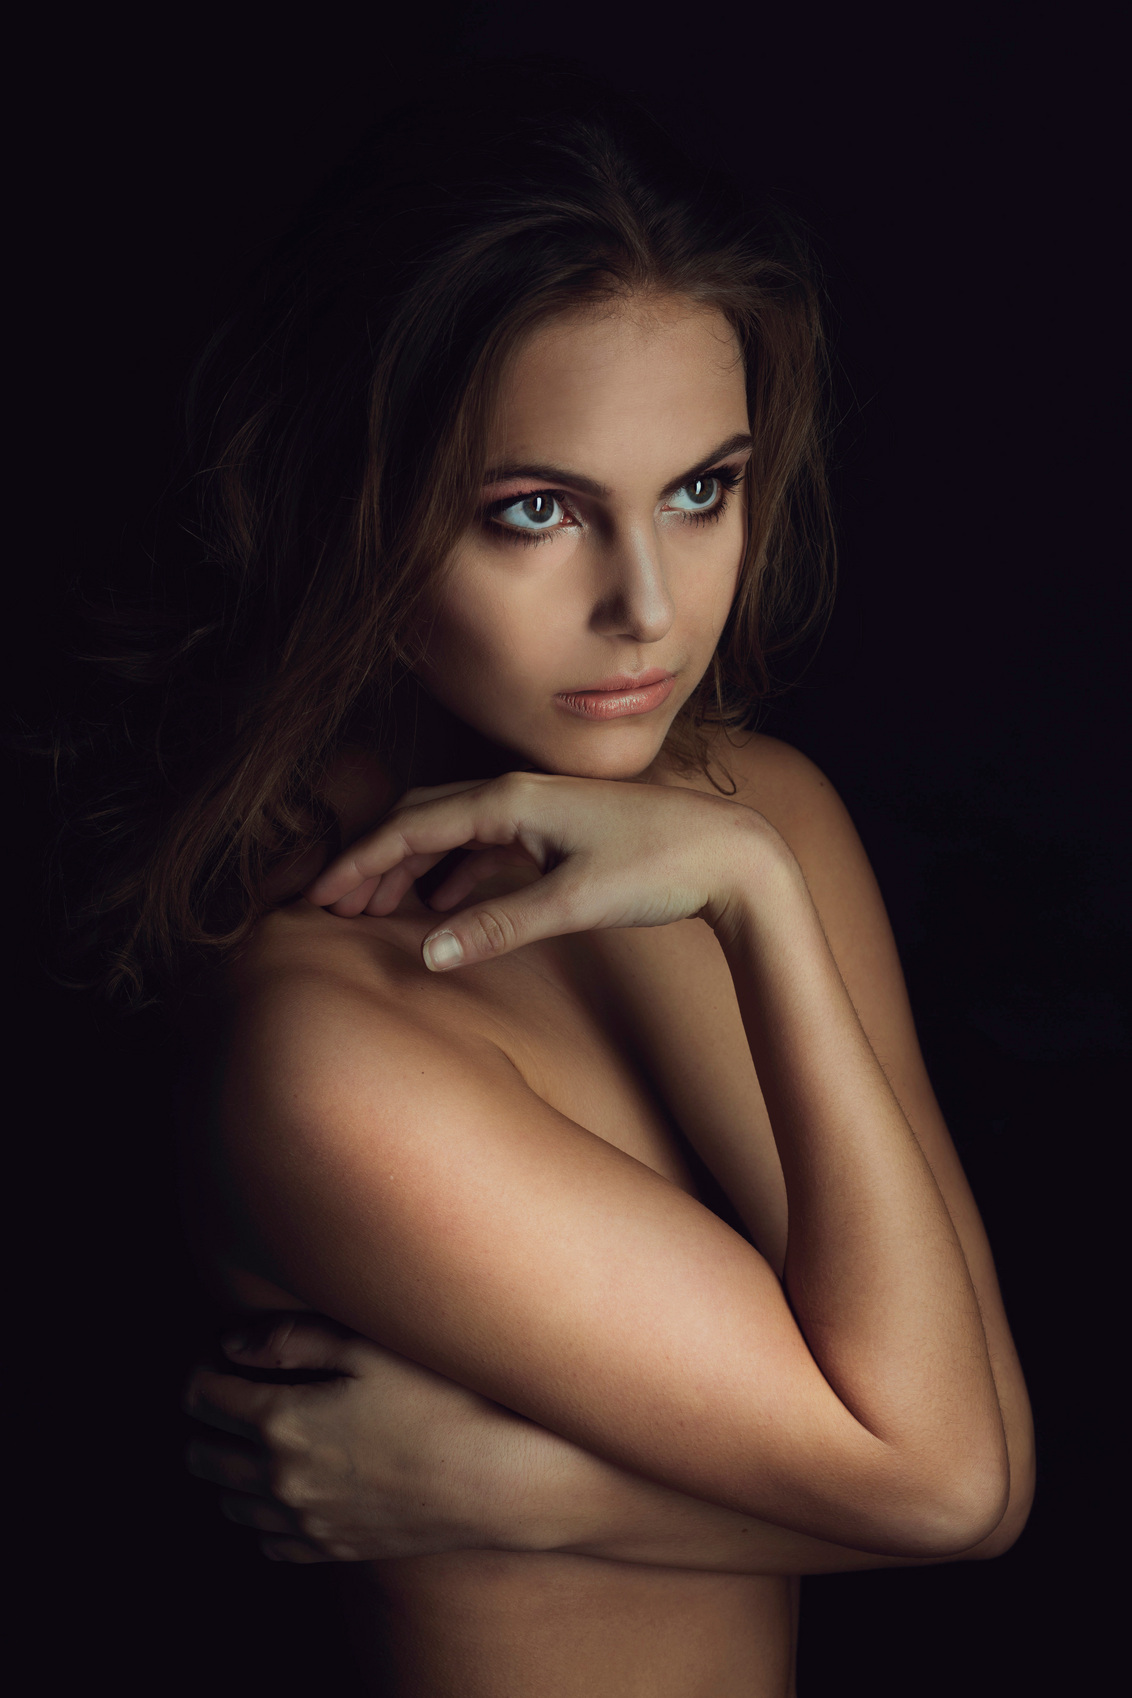 Vogue inspiration - . - foto door anoukstrijbos op 11-02-2015 - deze foto bevat: licht, portret, model, beauty, expressie, magazine